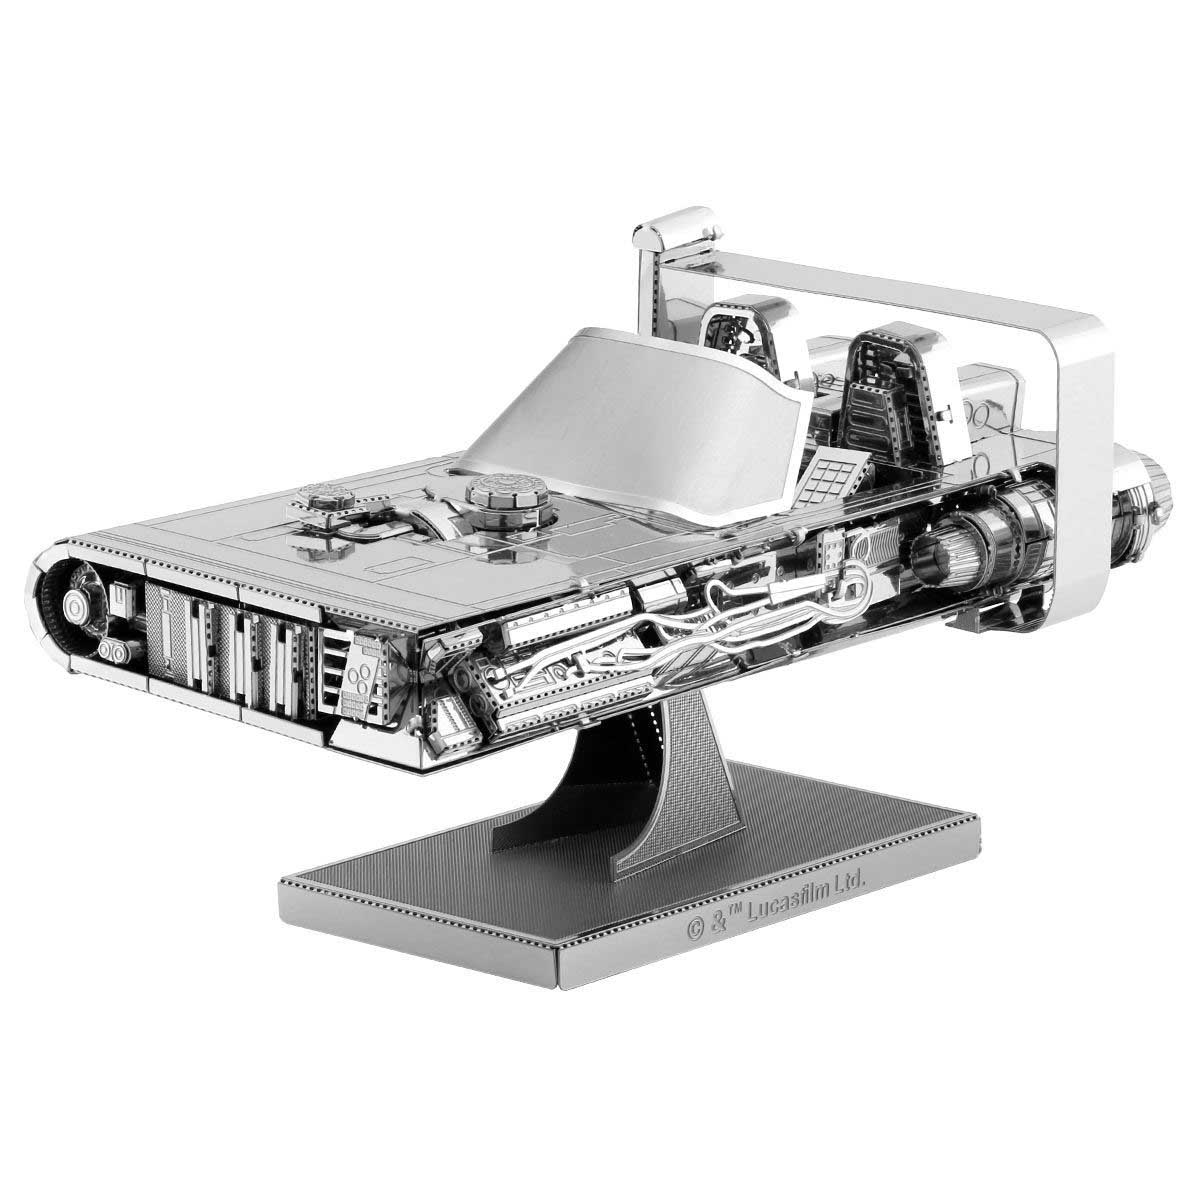 Han's Speeder Space 3D Puzzle